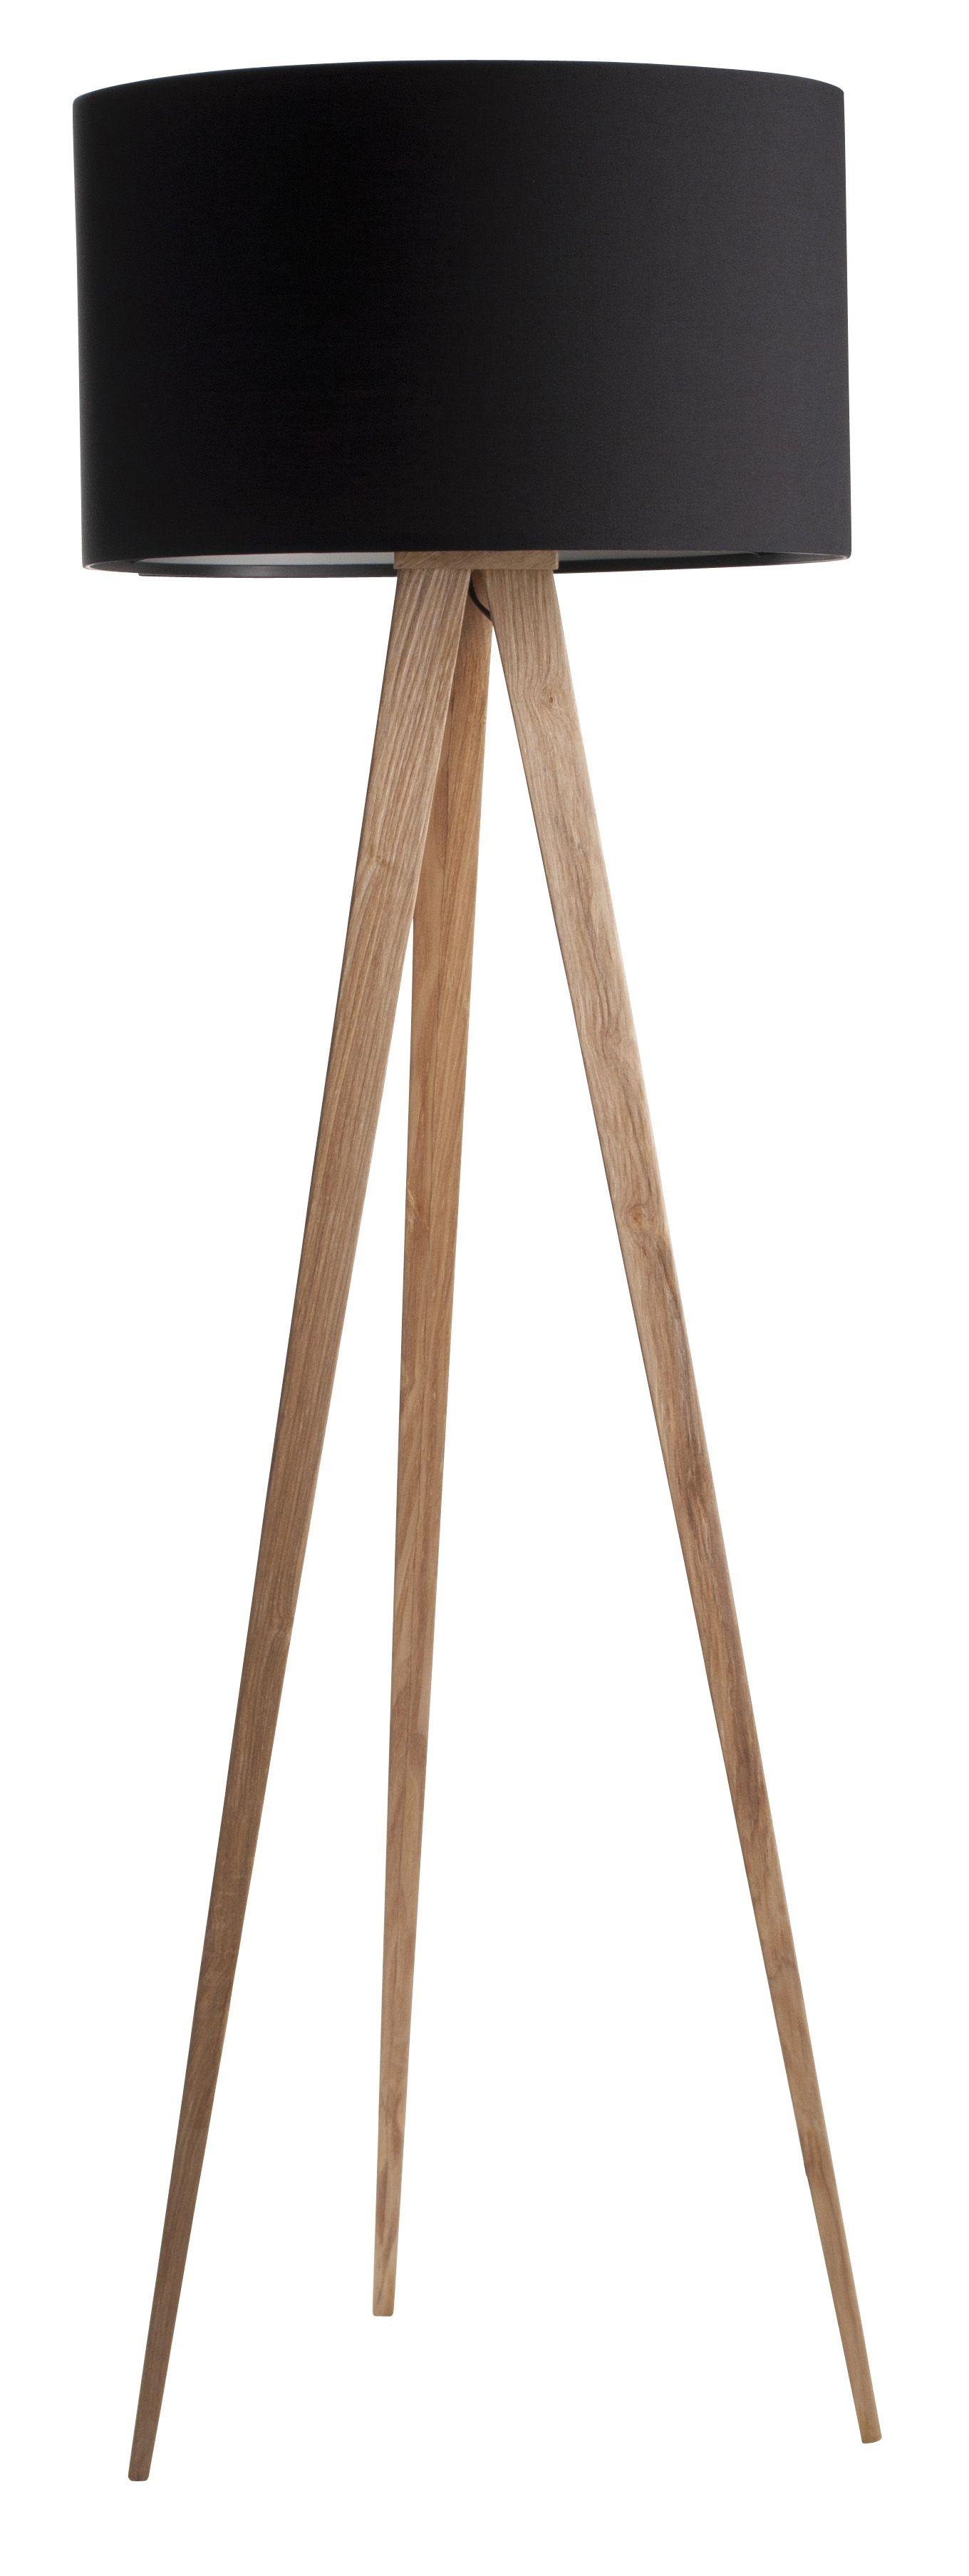 Tripod Wood Floor Lamp Zuiver Wood Floor Lamp Modern Floor Lamp Design Floor Lamp